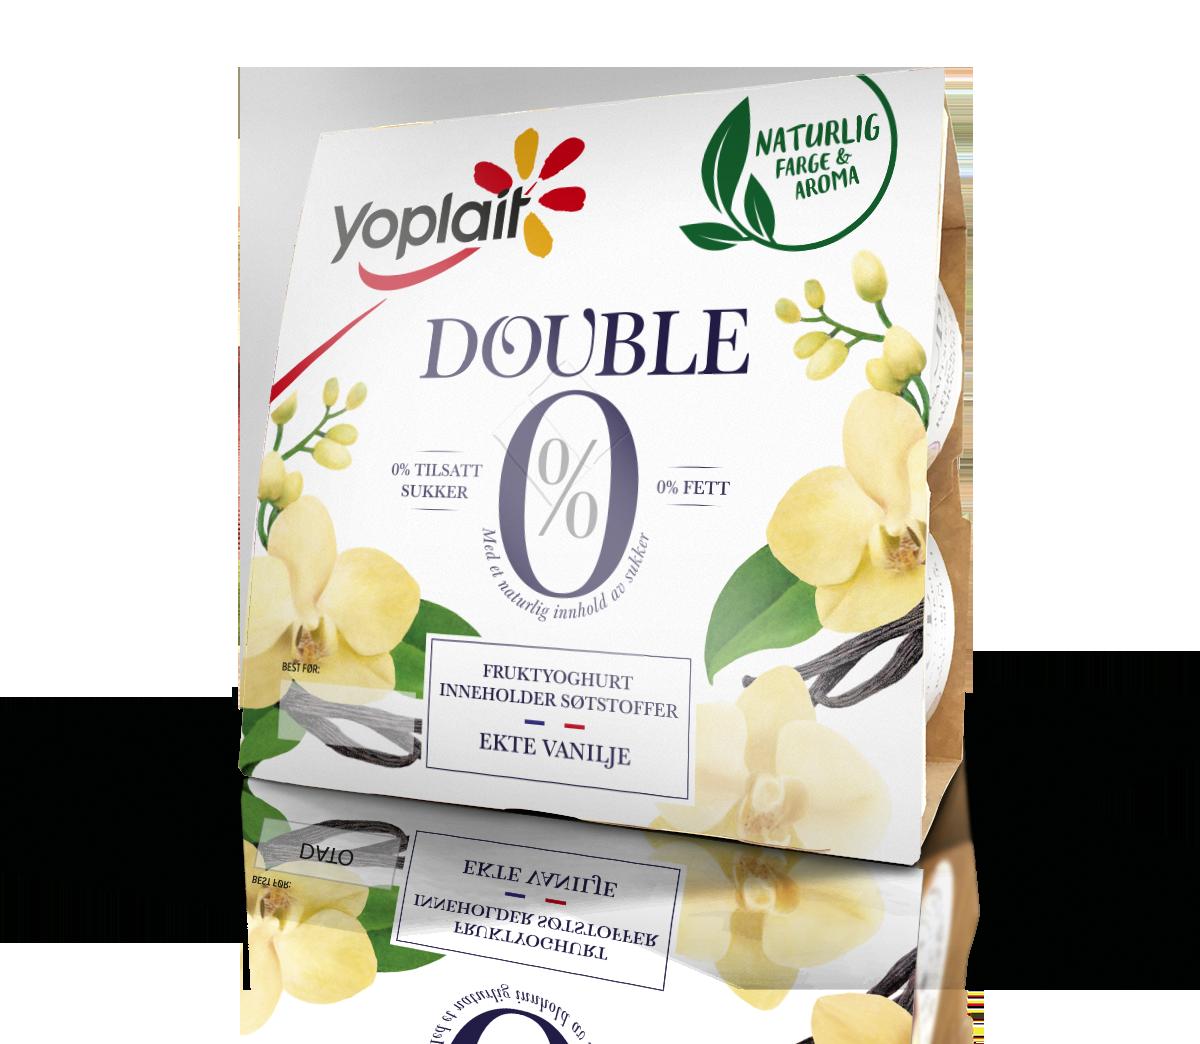 Double 0% Ekte Vanilje